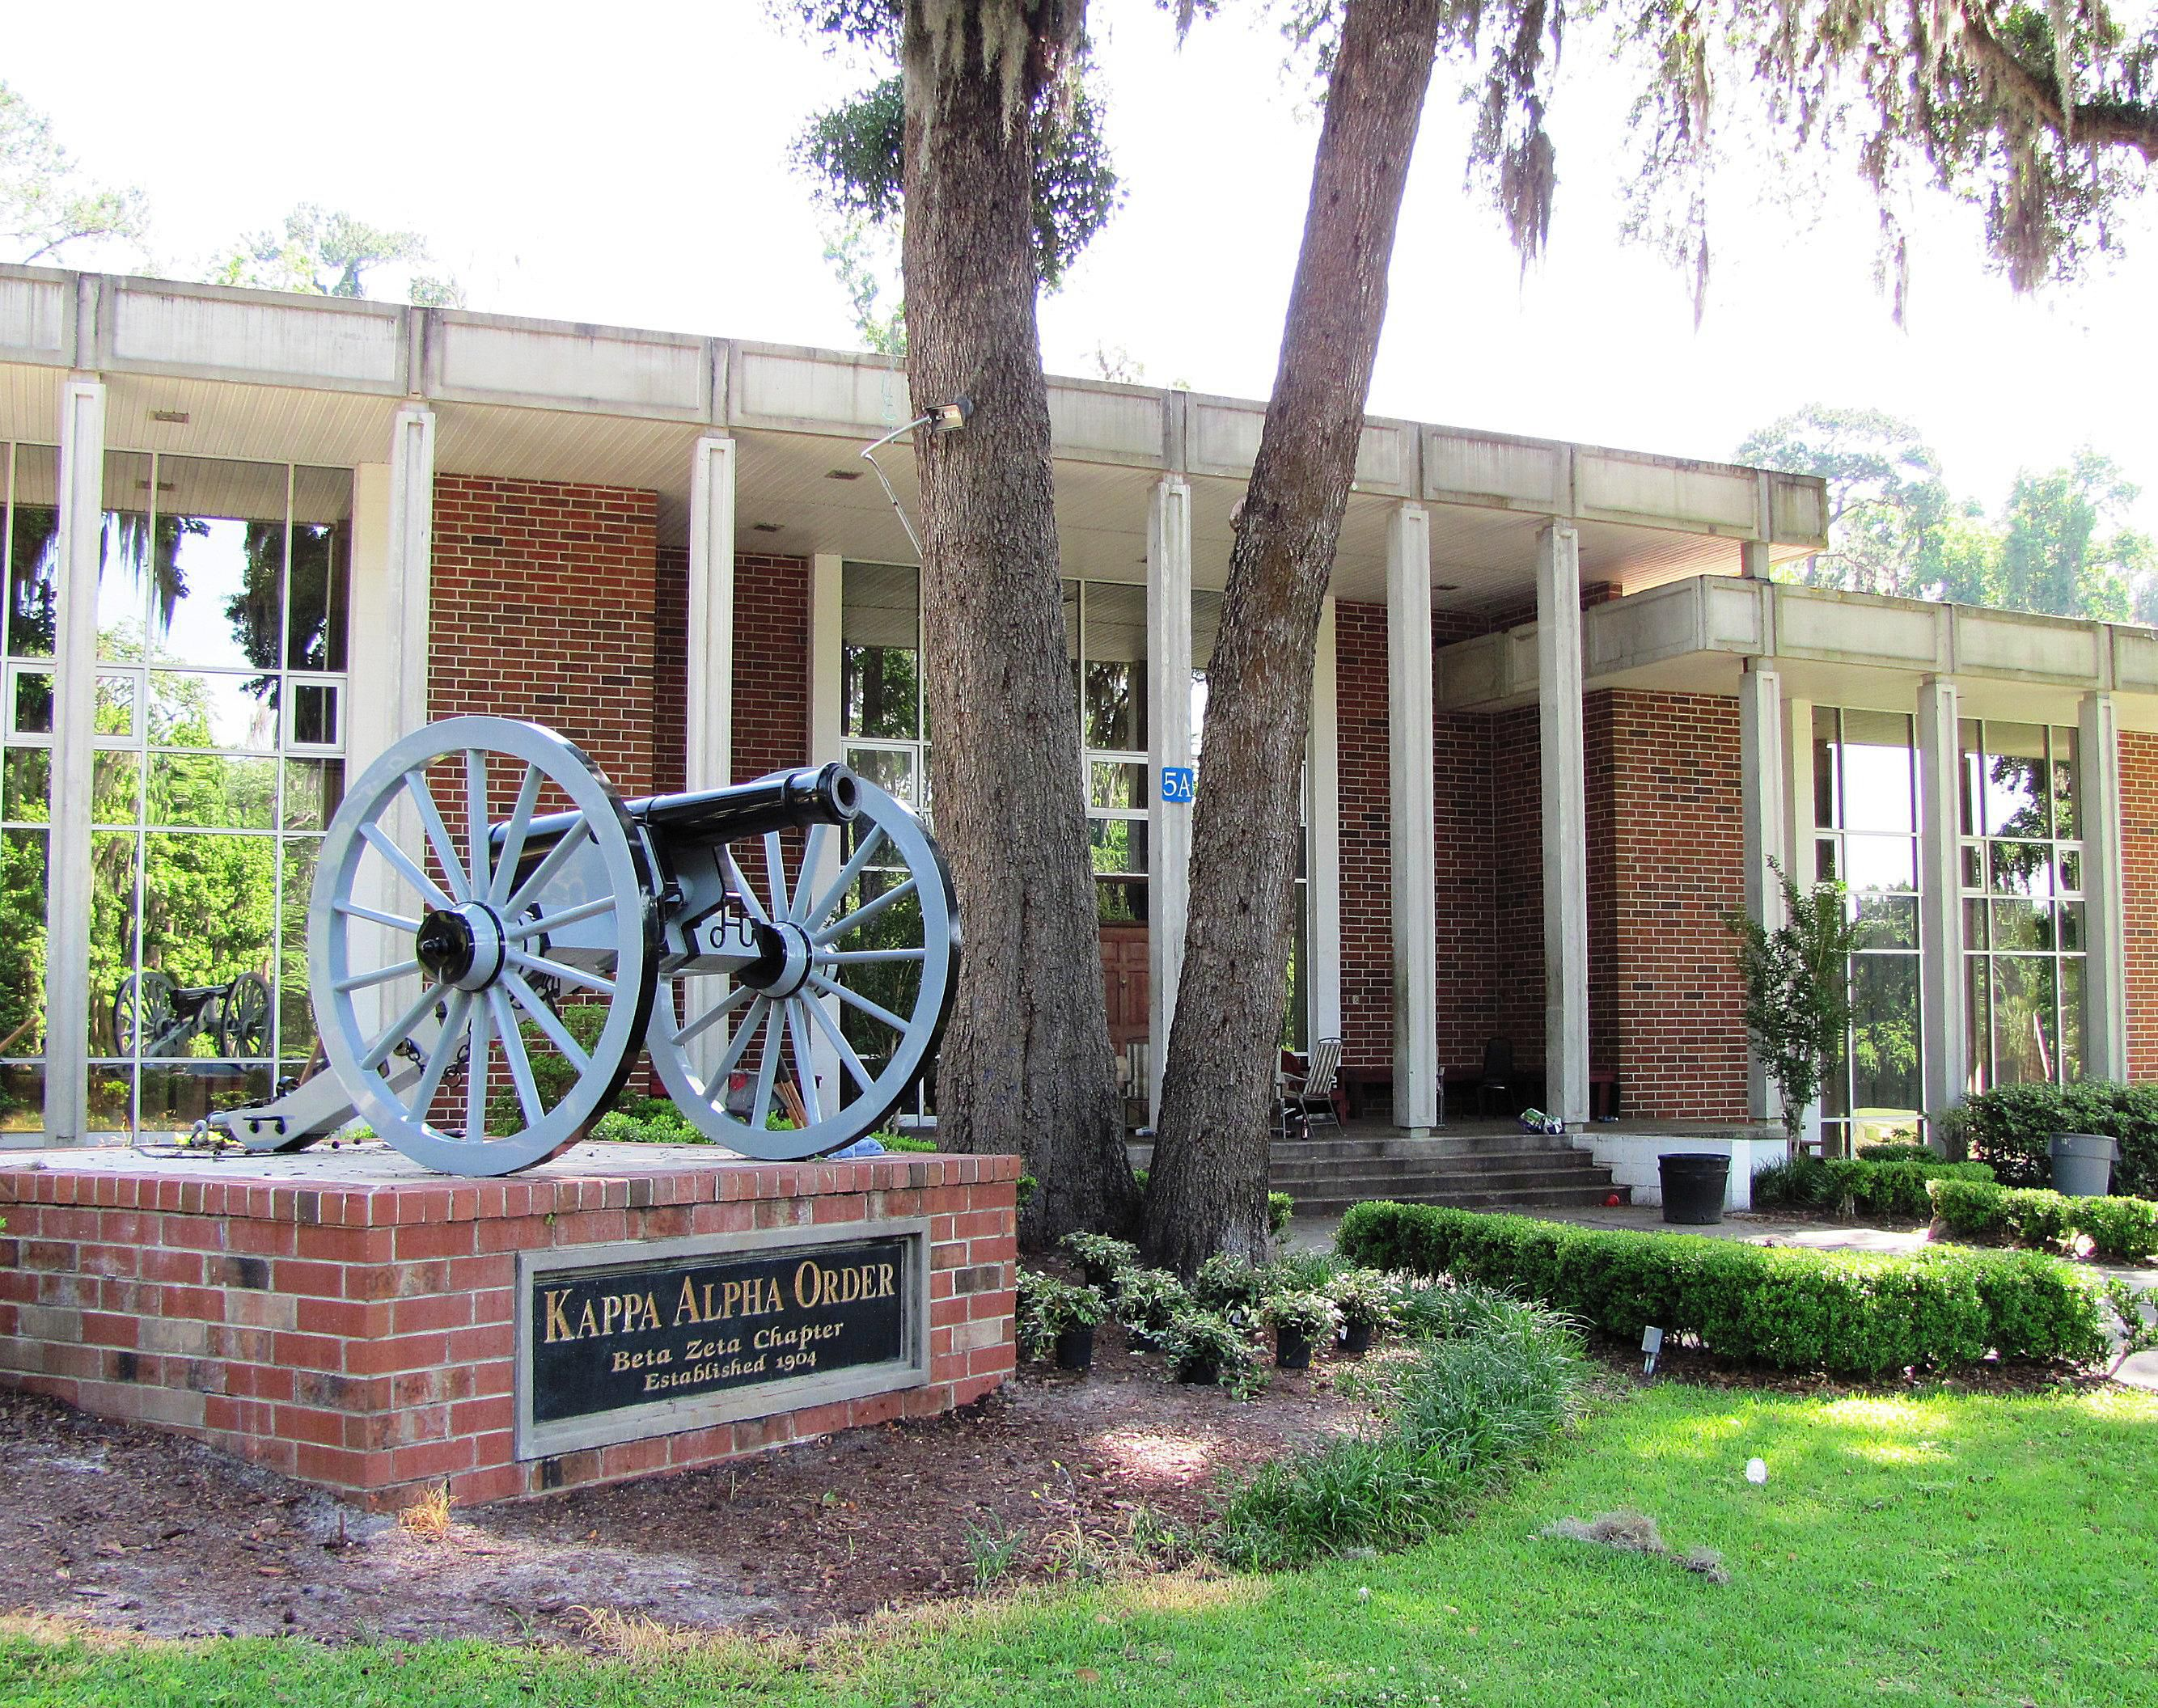 Kappa Alpha Fraternity at the University of Florida